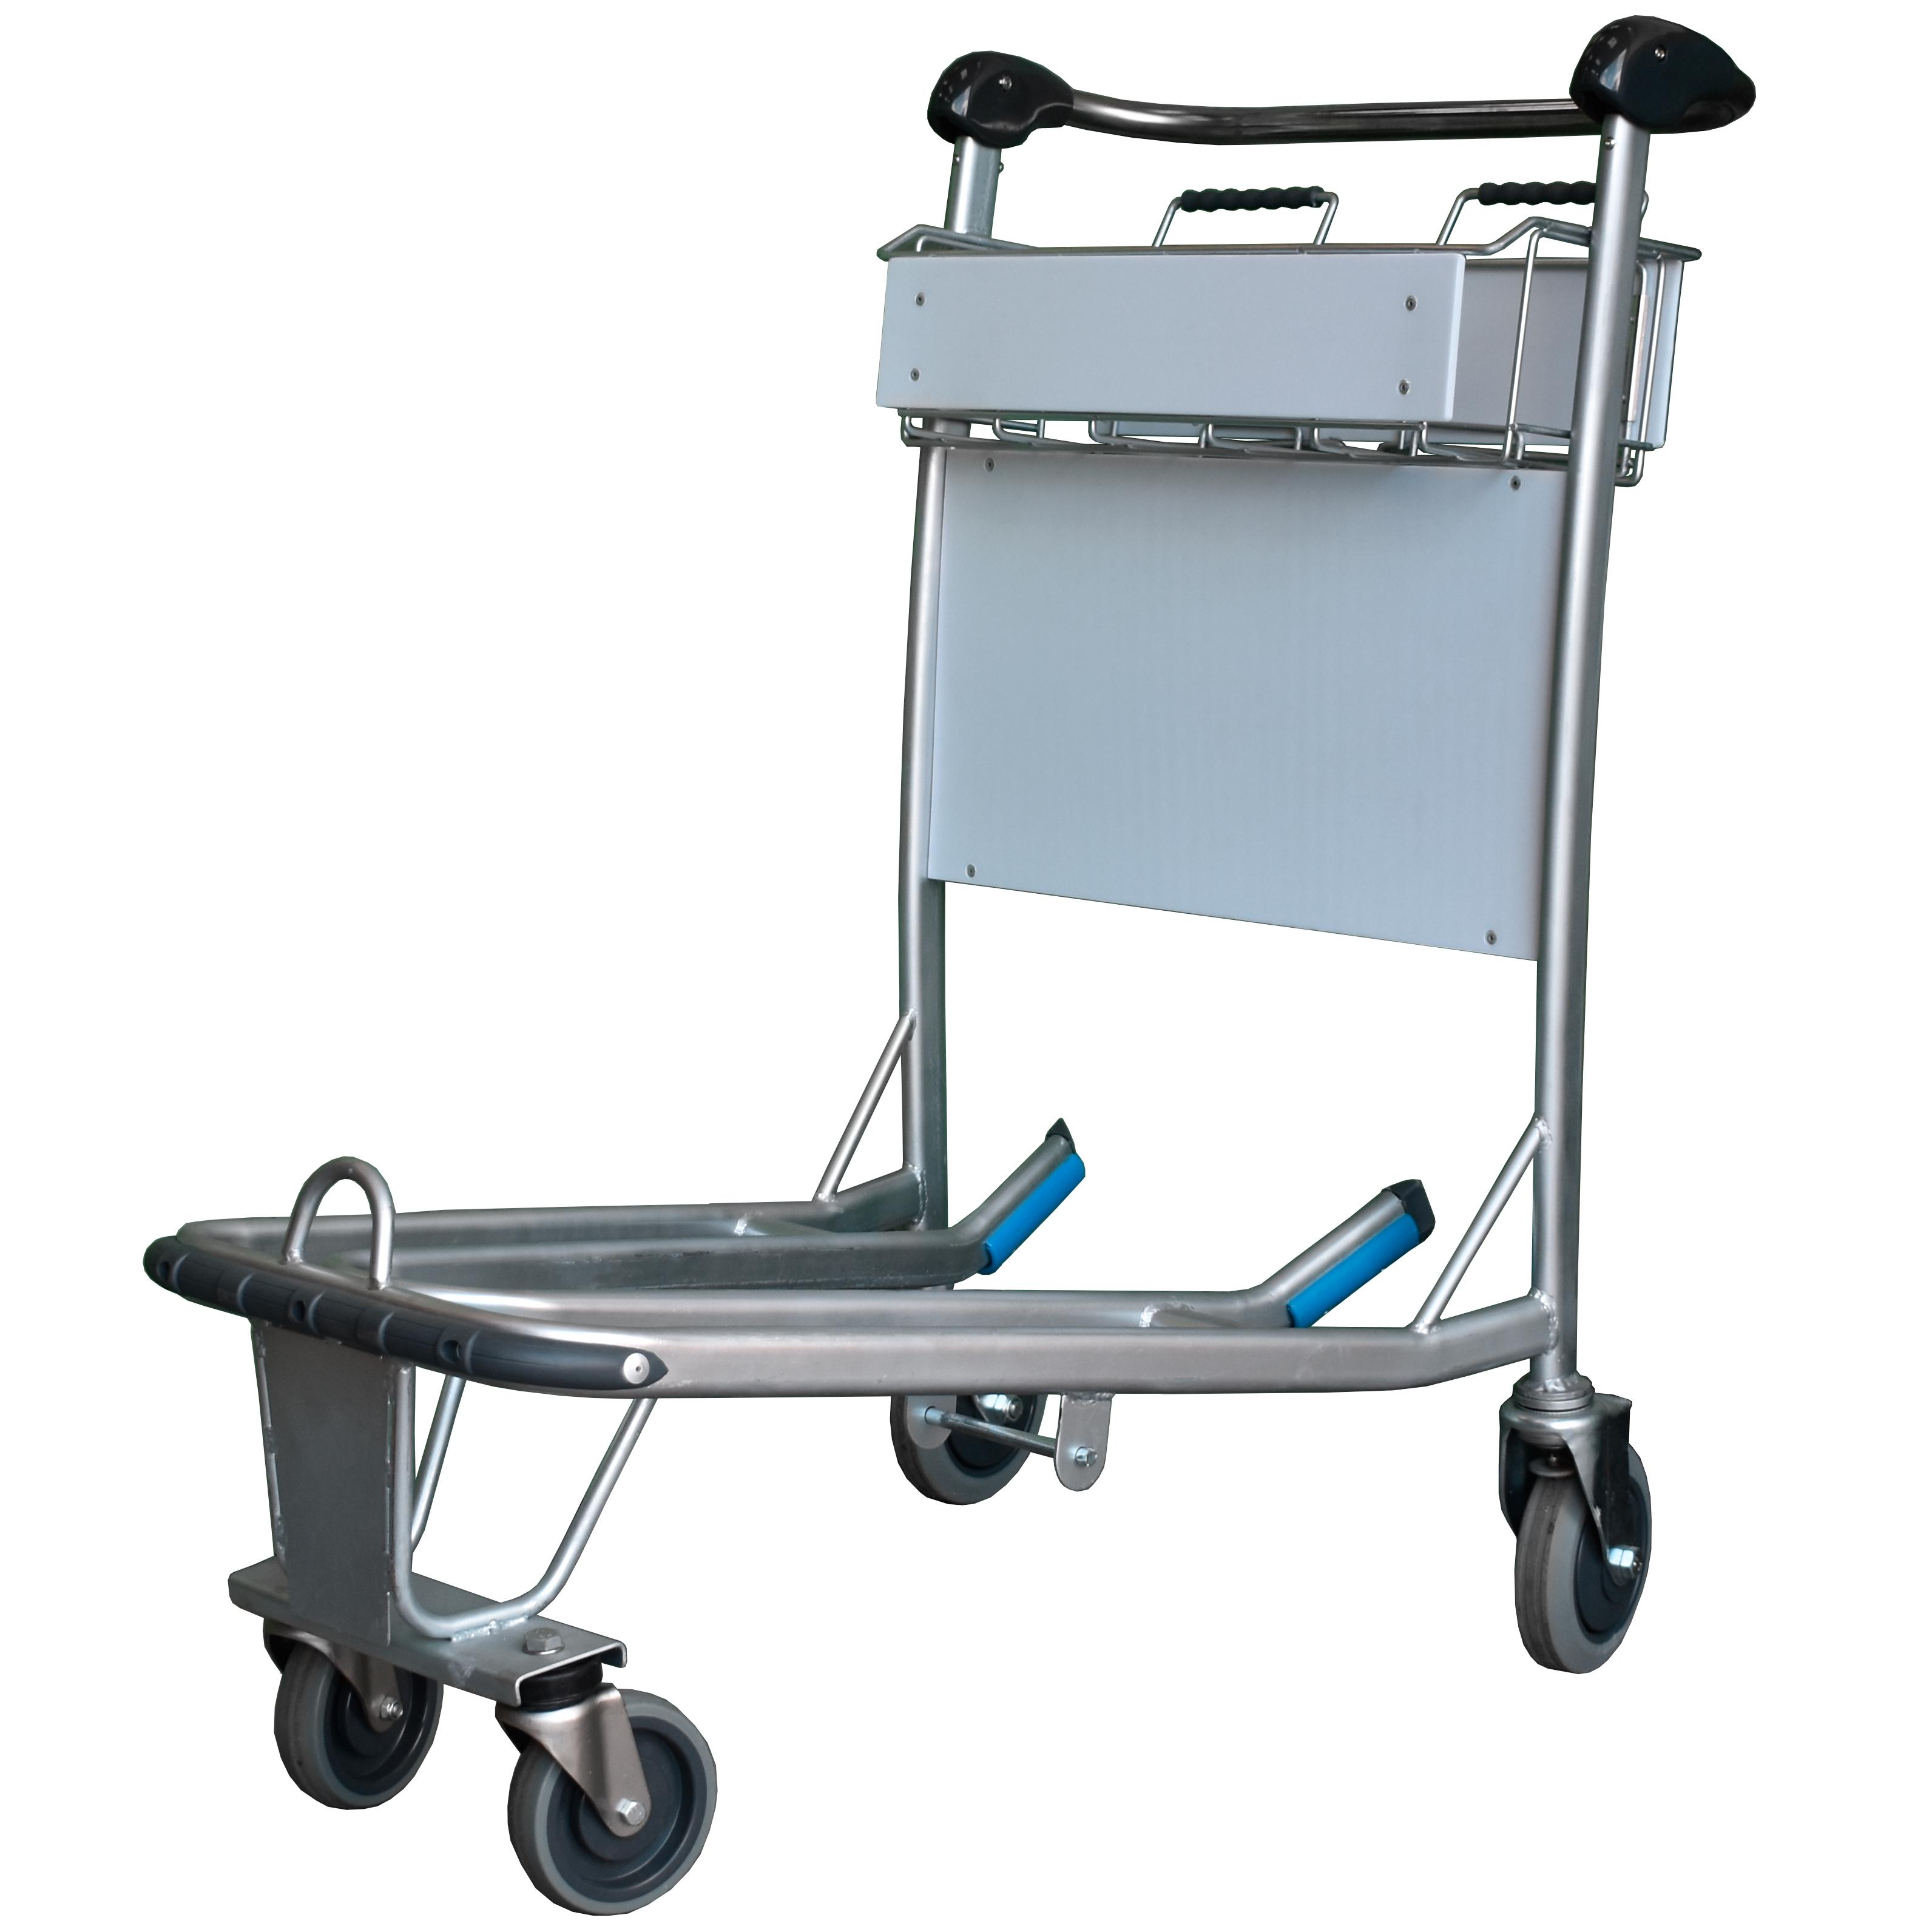 1a404f37ddf5 Explorer Range - Stainless Steel Baggage Trolley - 4 Wheels ...